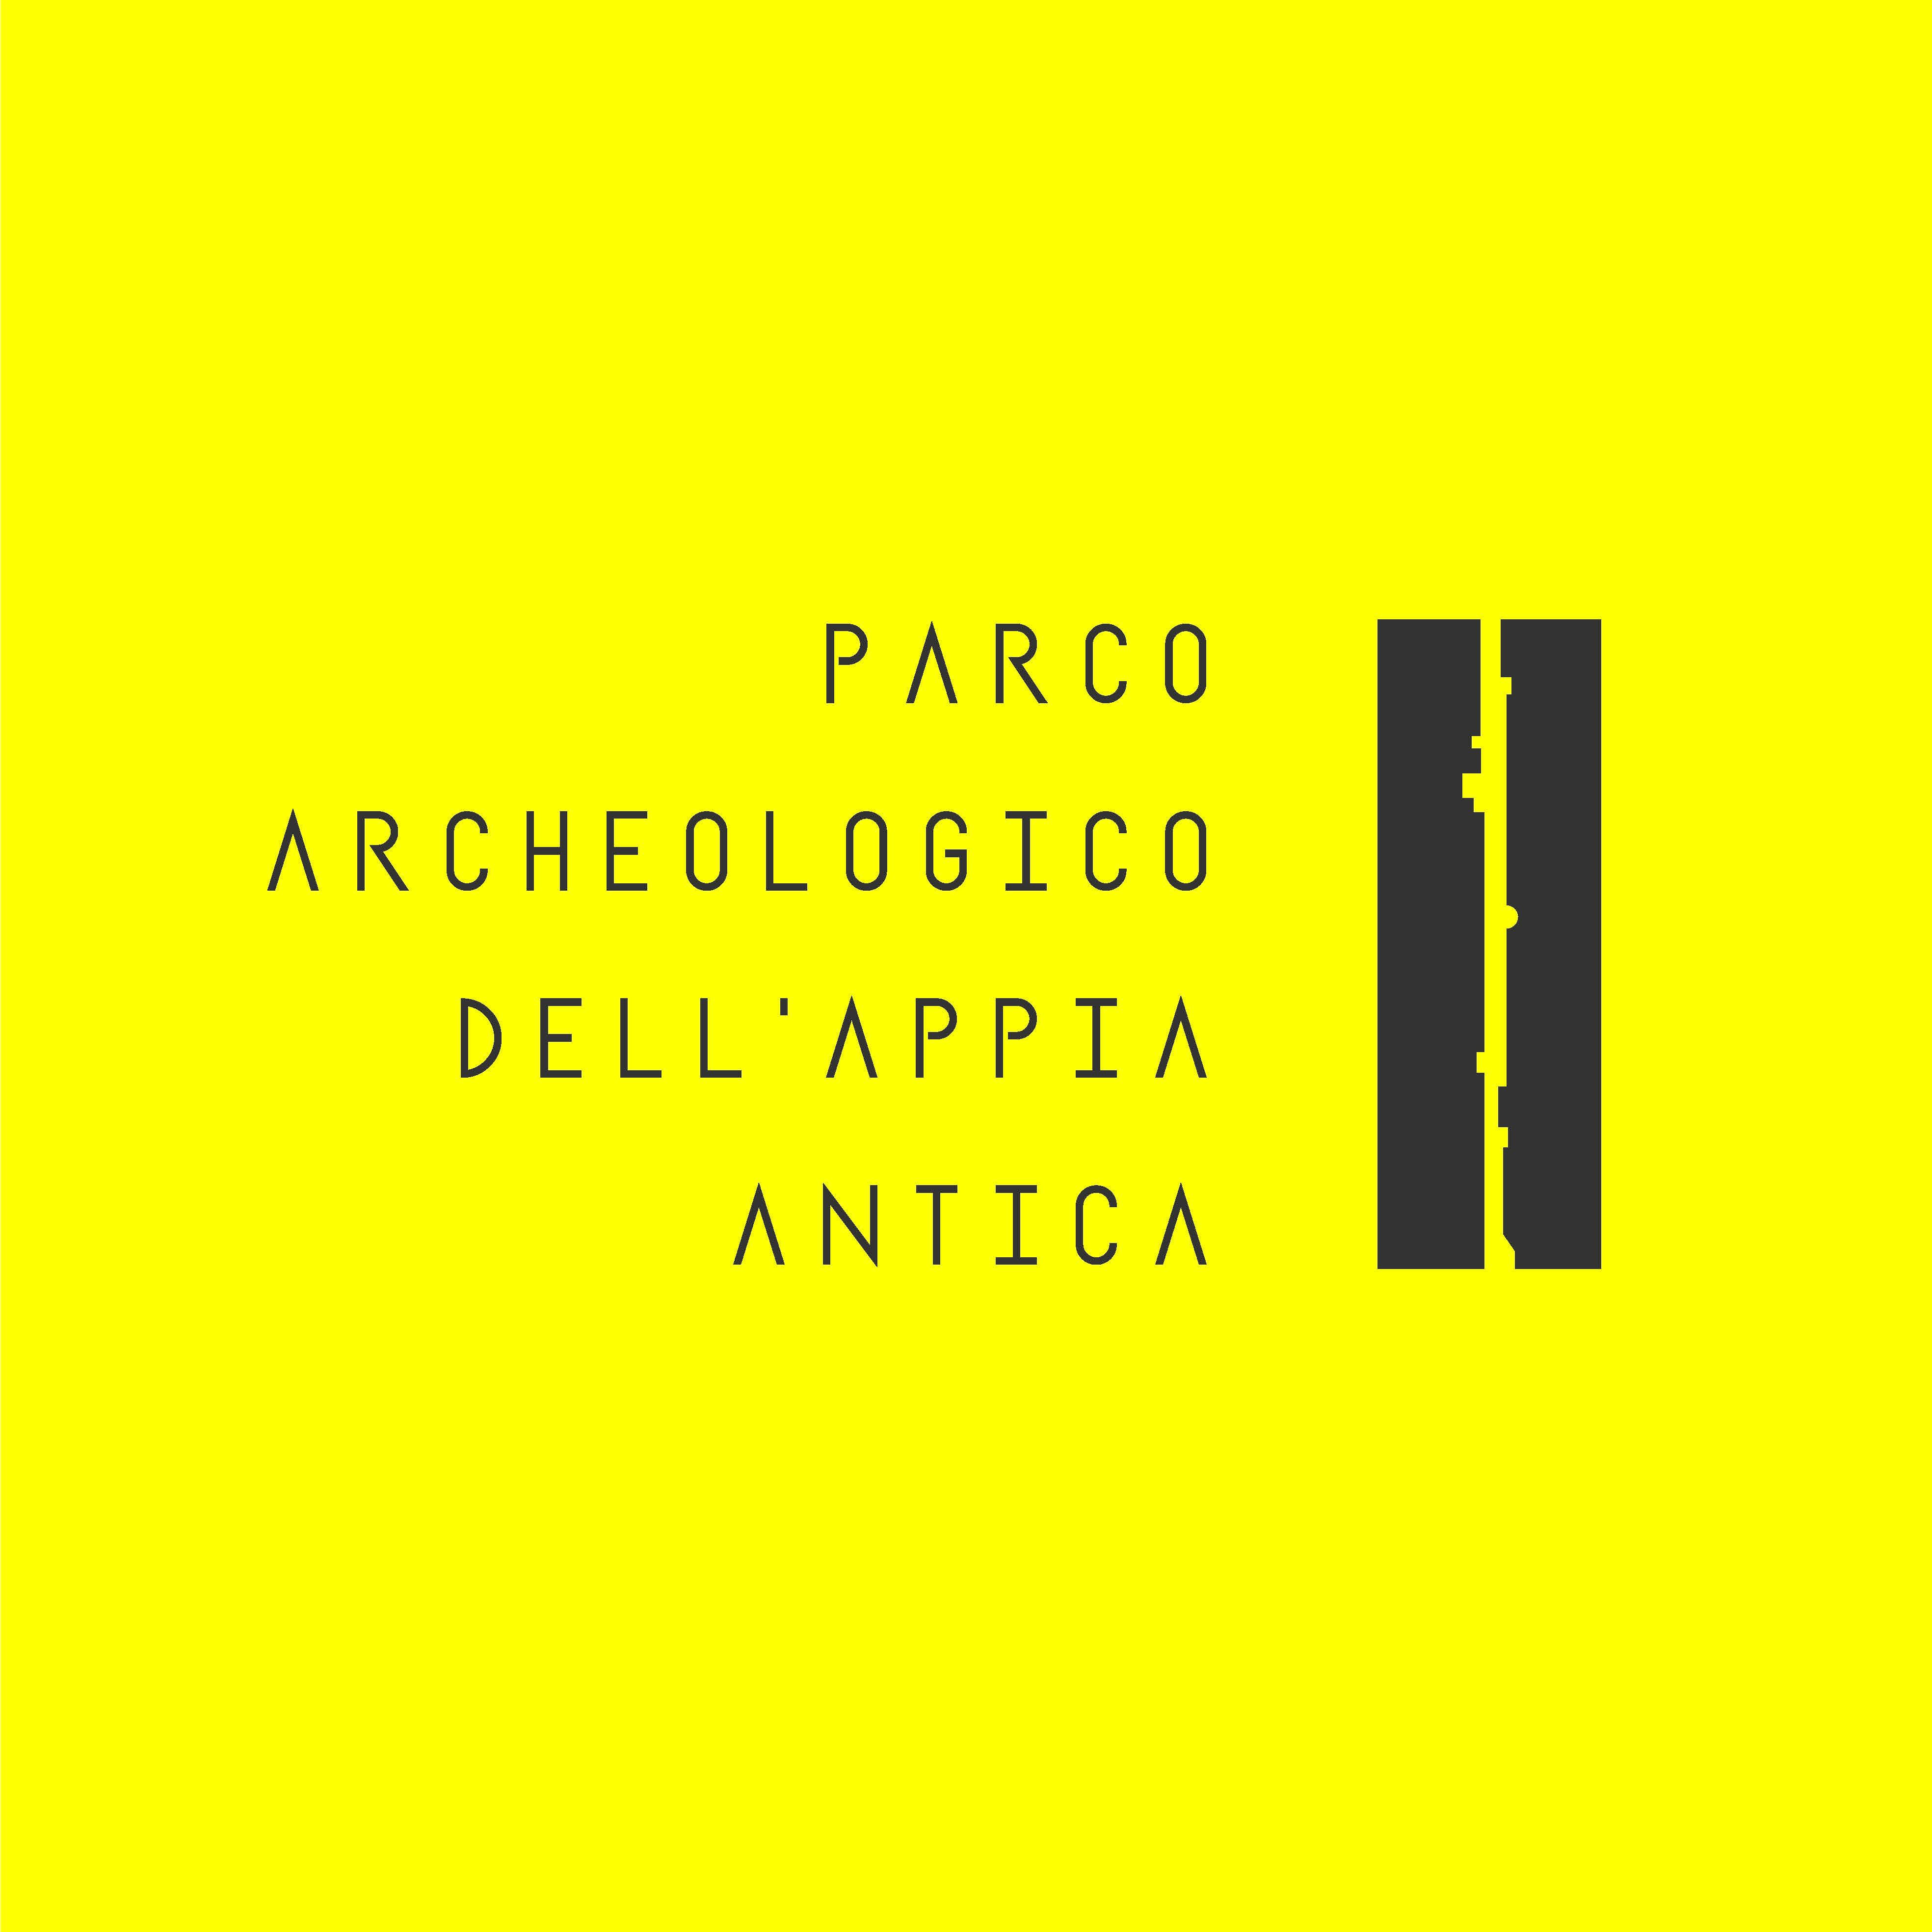 Parco Archeologico Appia Antica